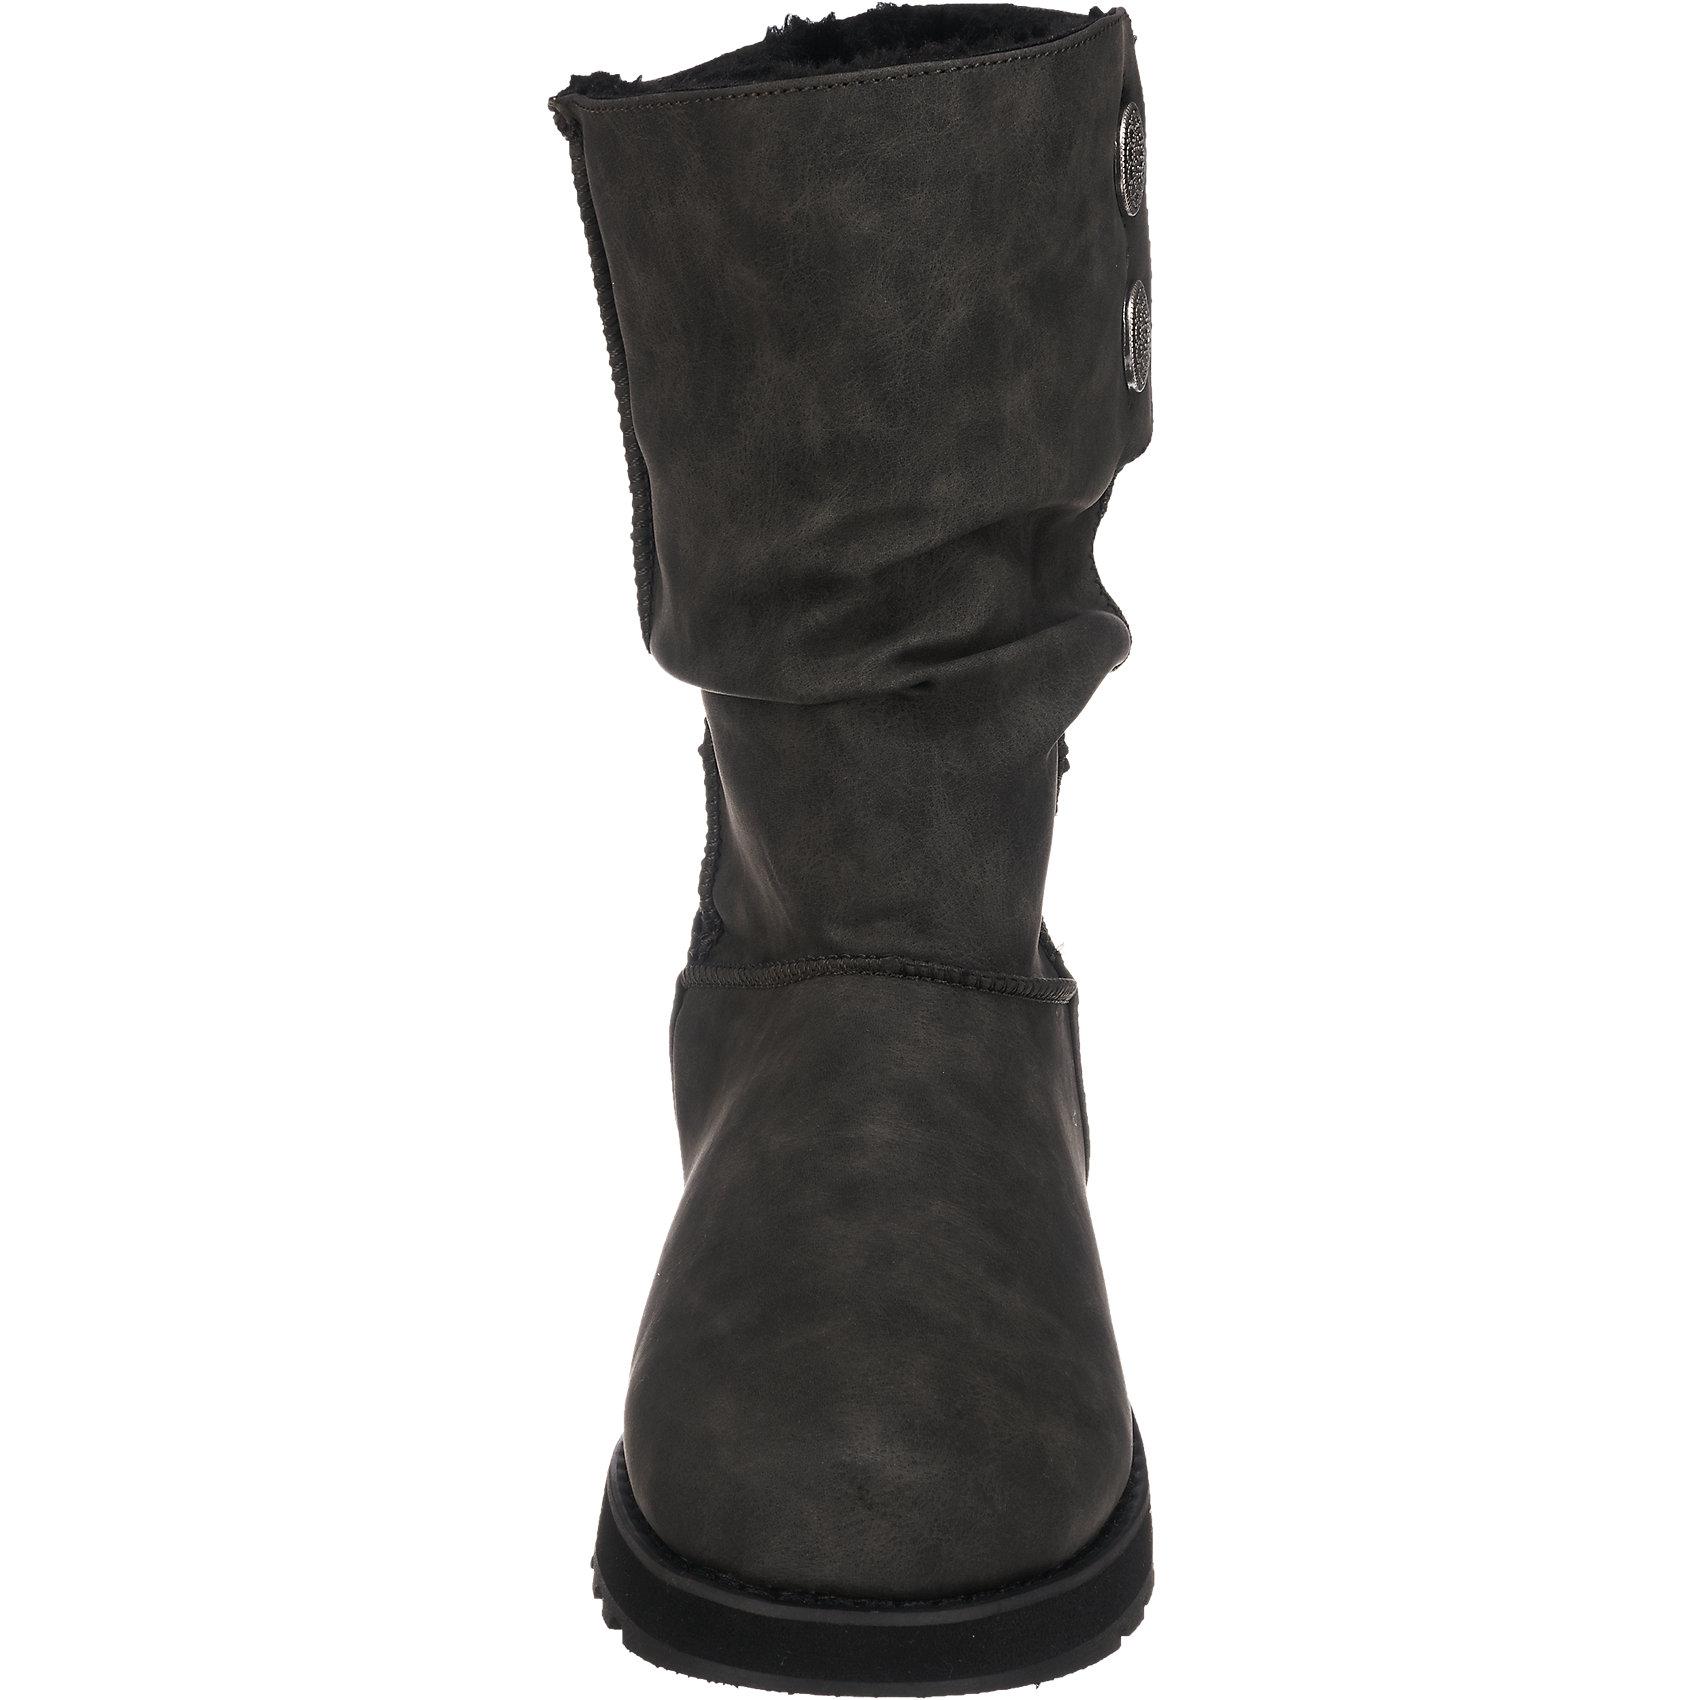 Neu SKECHERS Keepsakes Lederette Stiefel 6836725 Damen für Damen 6836725 grau 267c97